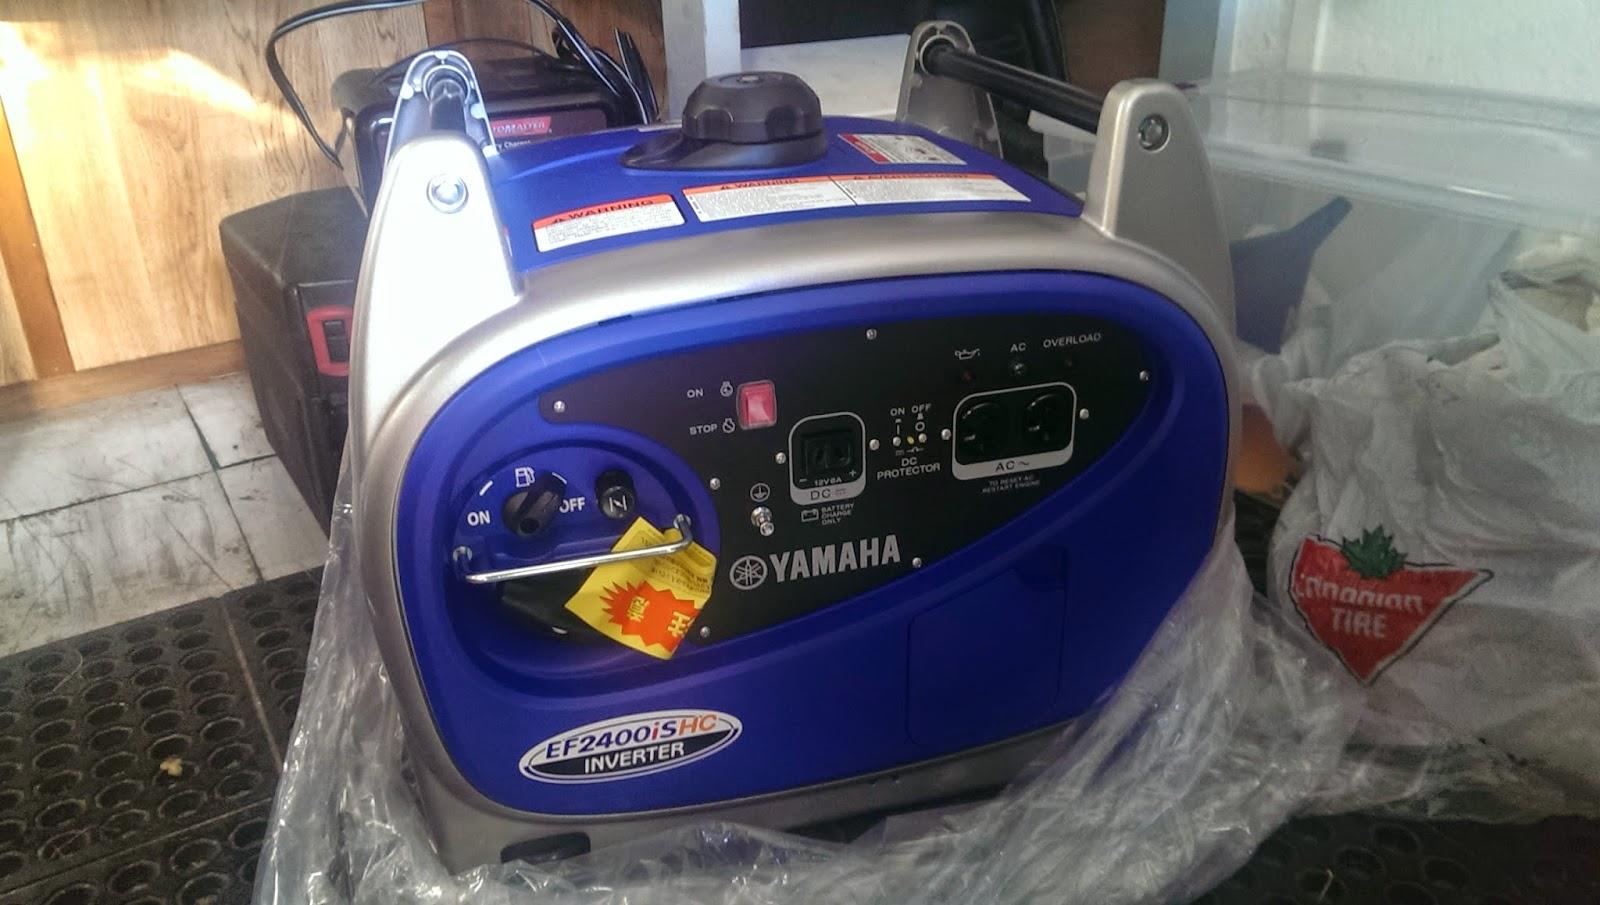 EFYamaha2400iSHC generator